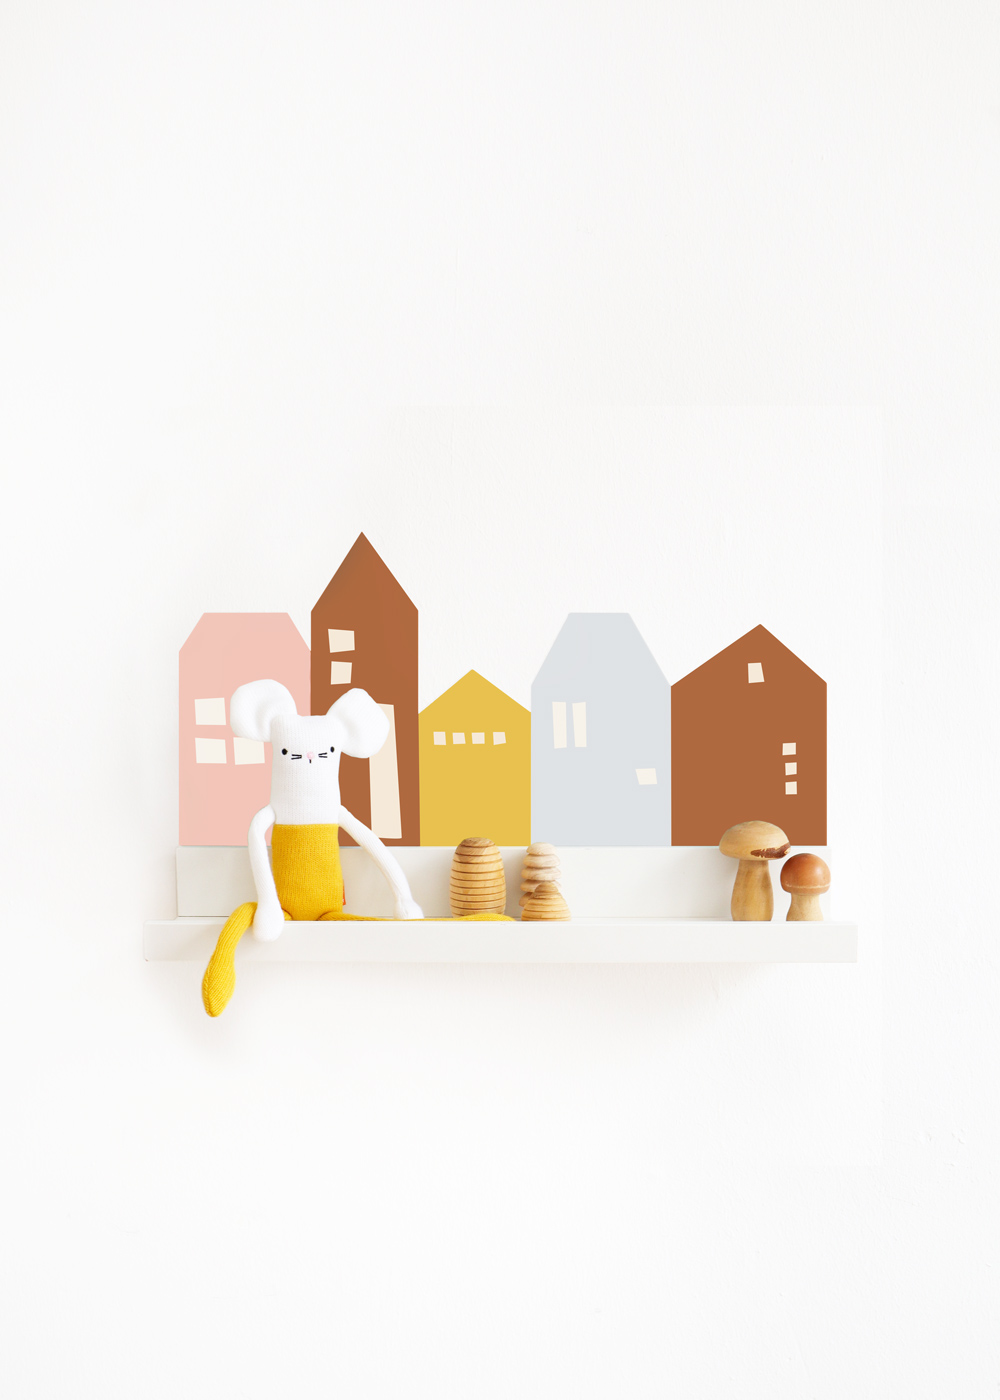 Ikea Mosslanda Bilderleiste Lille Hus eisblau camel Komplettansicht